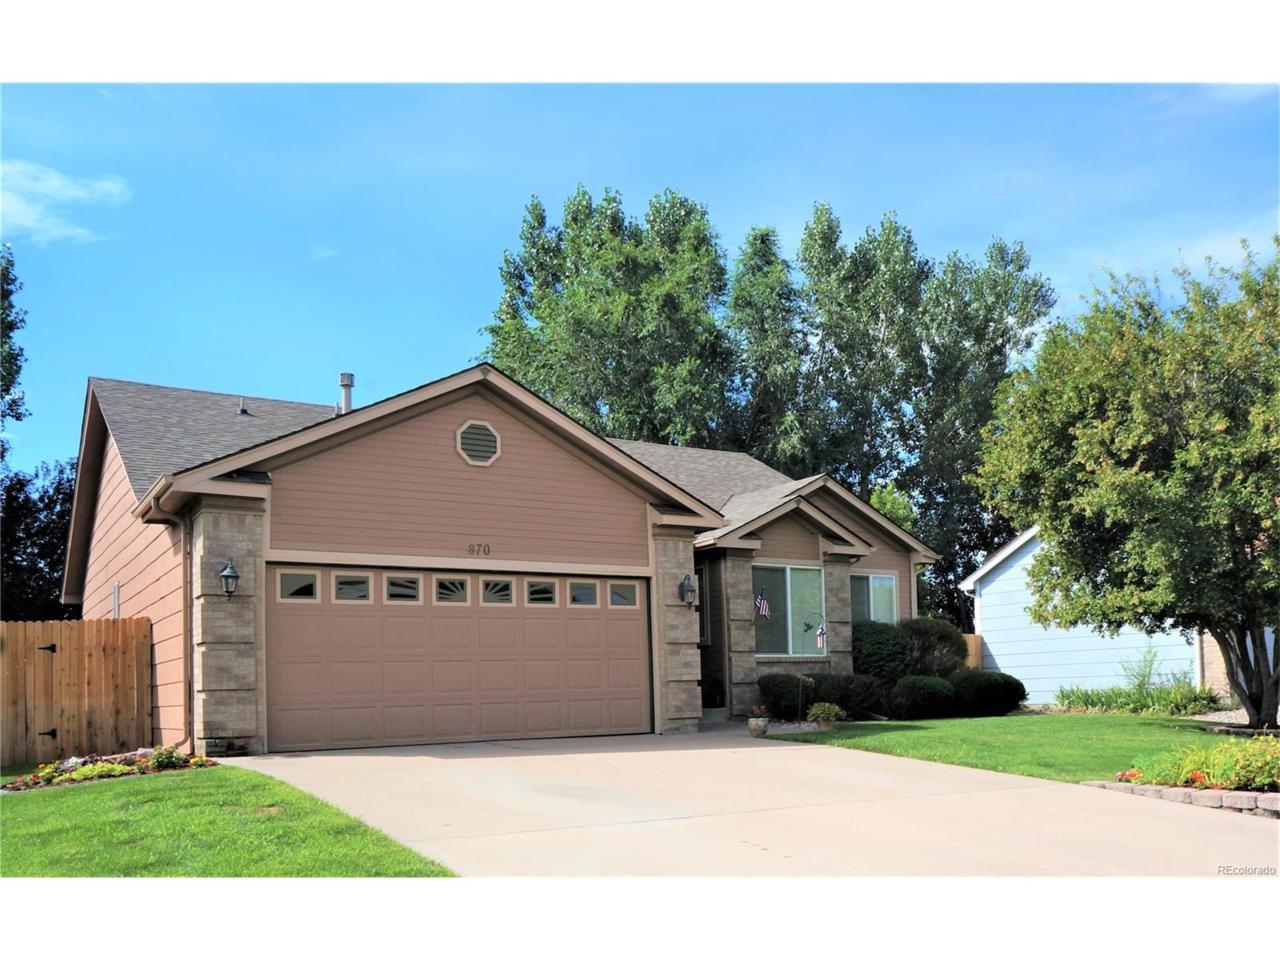 870 Daffodil Street, Fountain, CO 80817 (MLS #3013024) :: 8z Real Estate